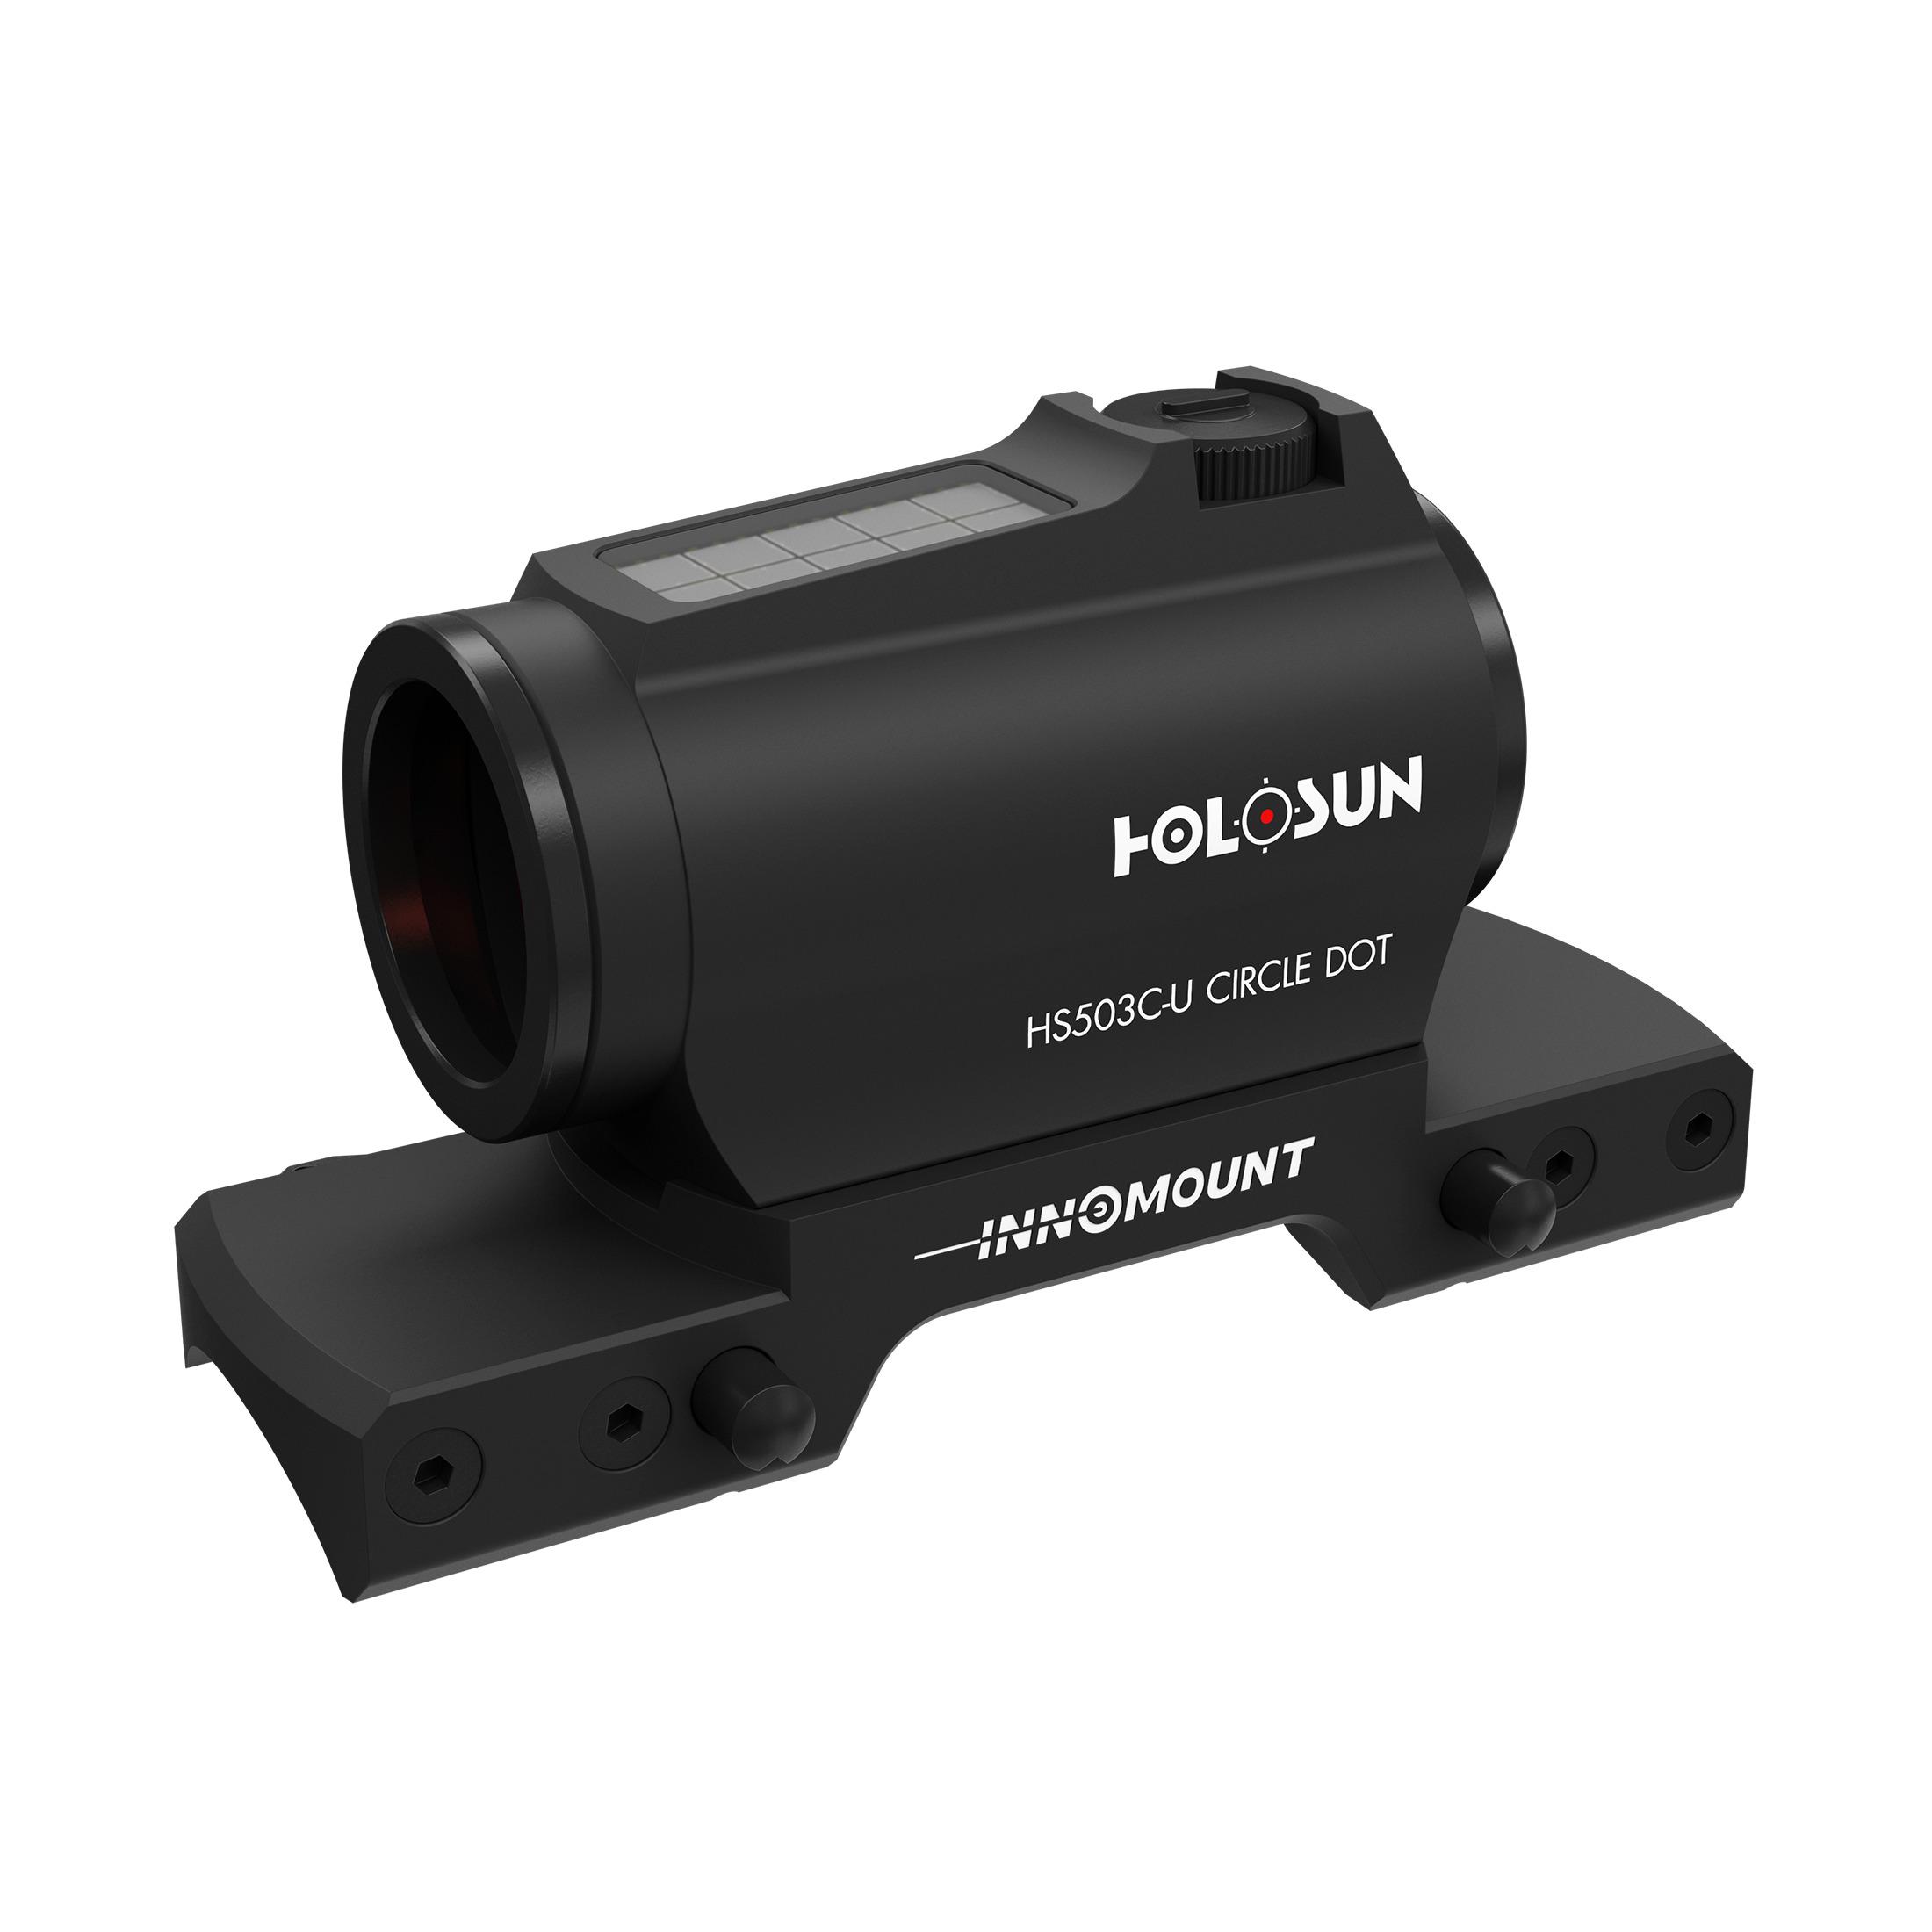 Holosun CLASSIC HS503C-U-MOUNT-BLASER